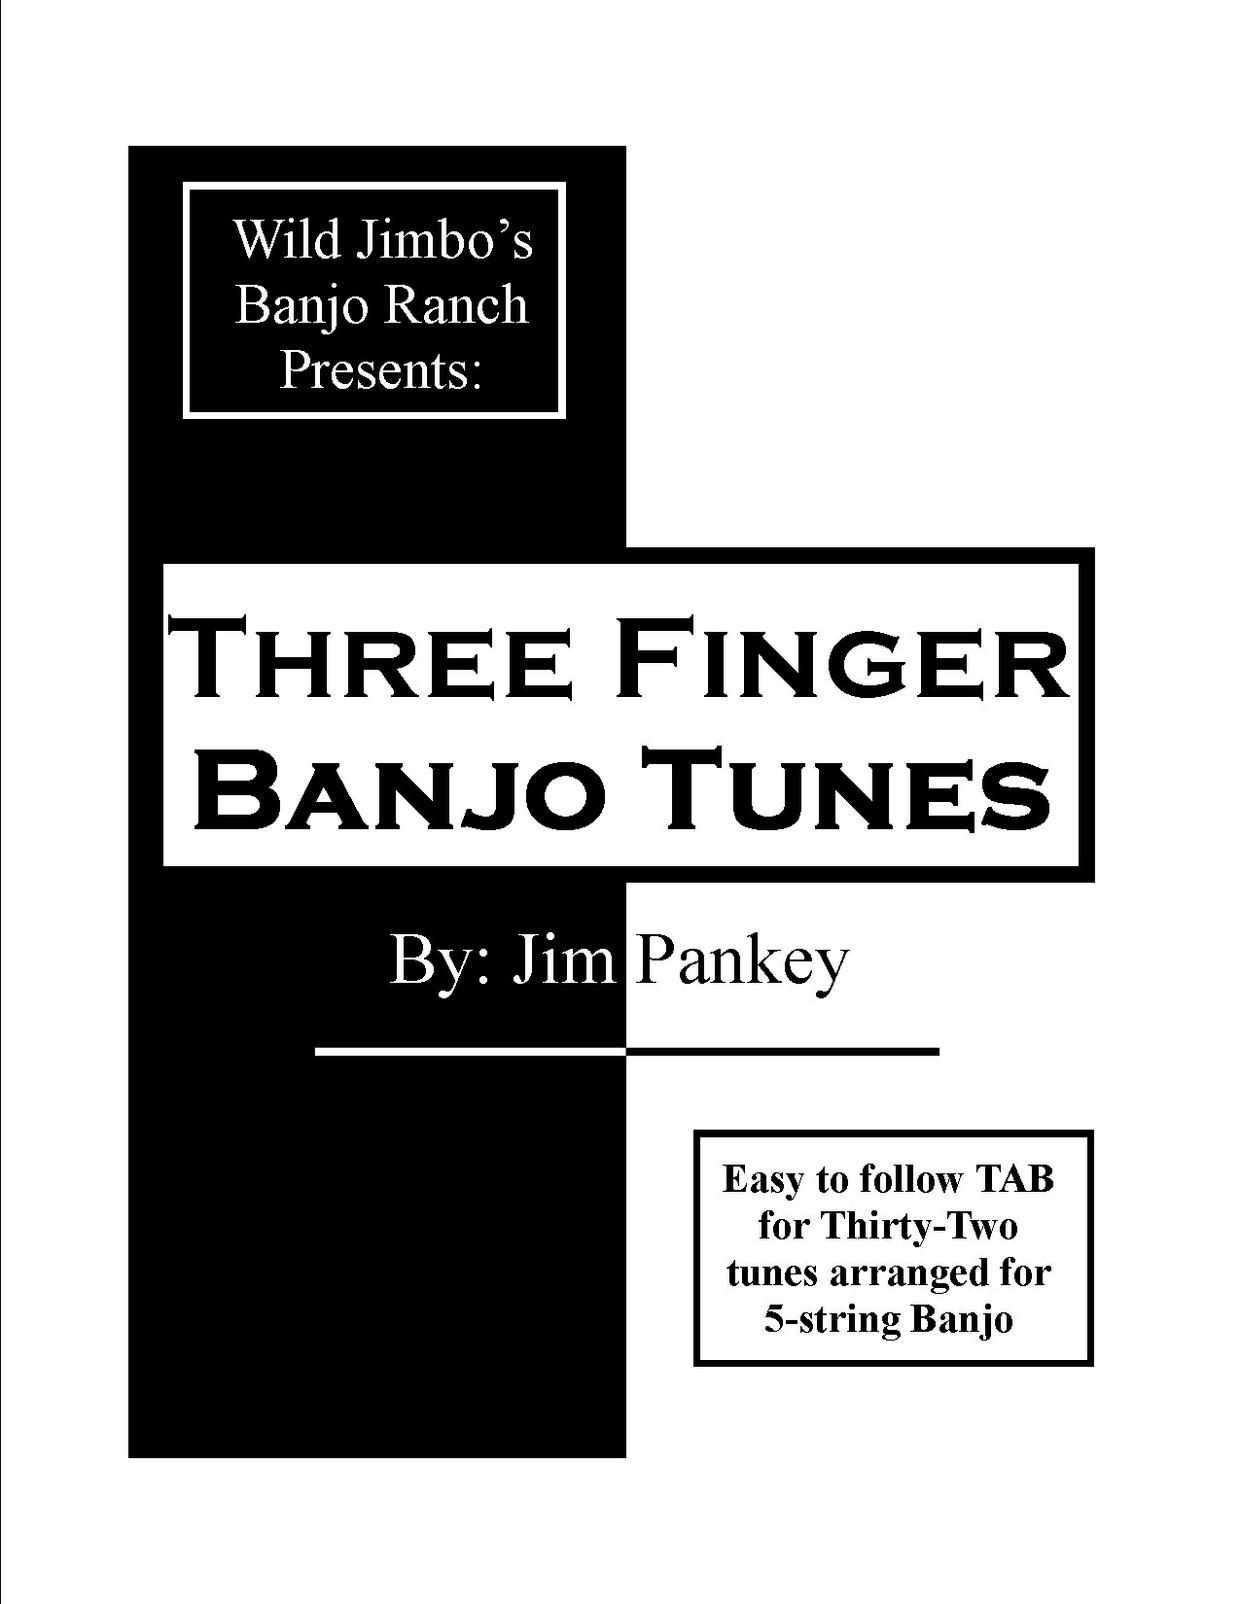 Three Finger Banjo Tunes